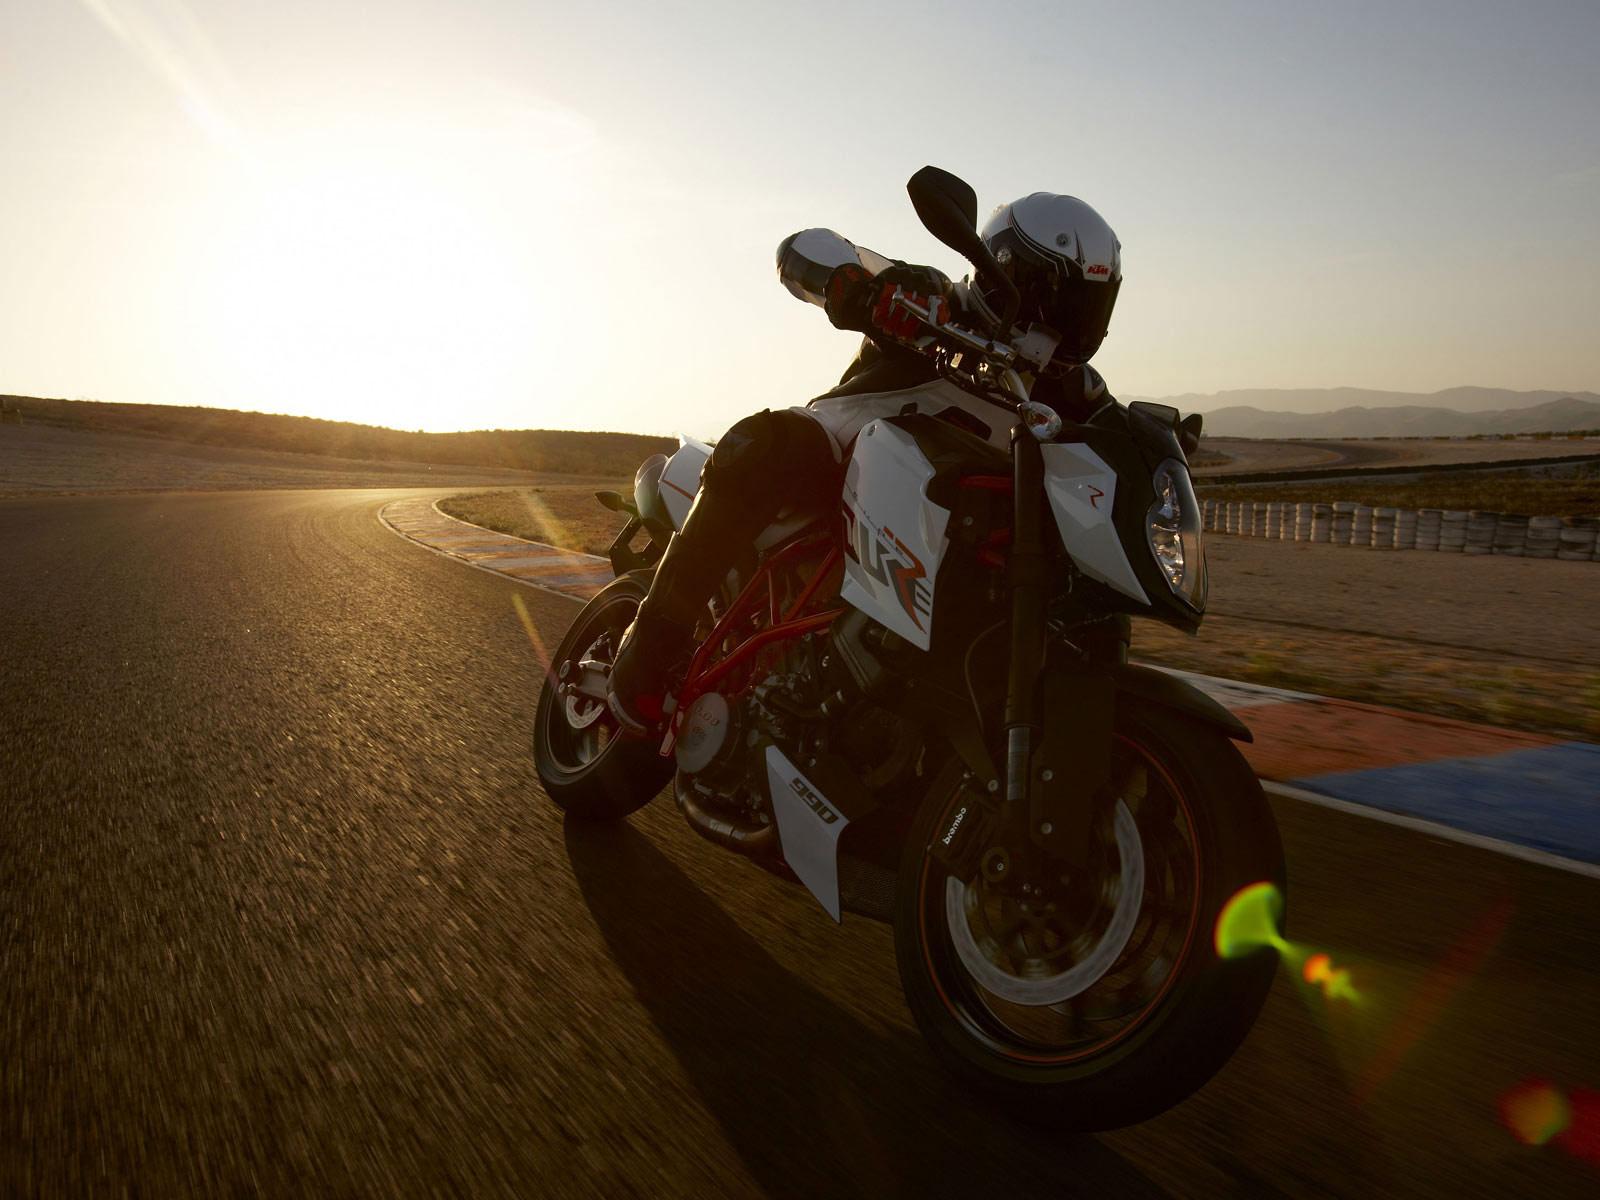 http://3.bp.blogspot.com/-HS1GJyMPP8E/Tnv681xtDGI/AAAAAAAABP8/BnAchOuWWYk/s1600/KTM_990-Super-Duke-R-2009-motorcycle-desktop-wallpaper_03.jpg